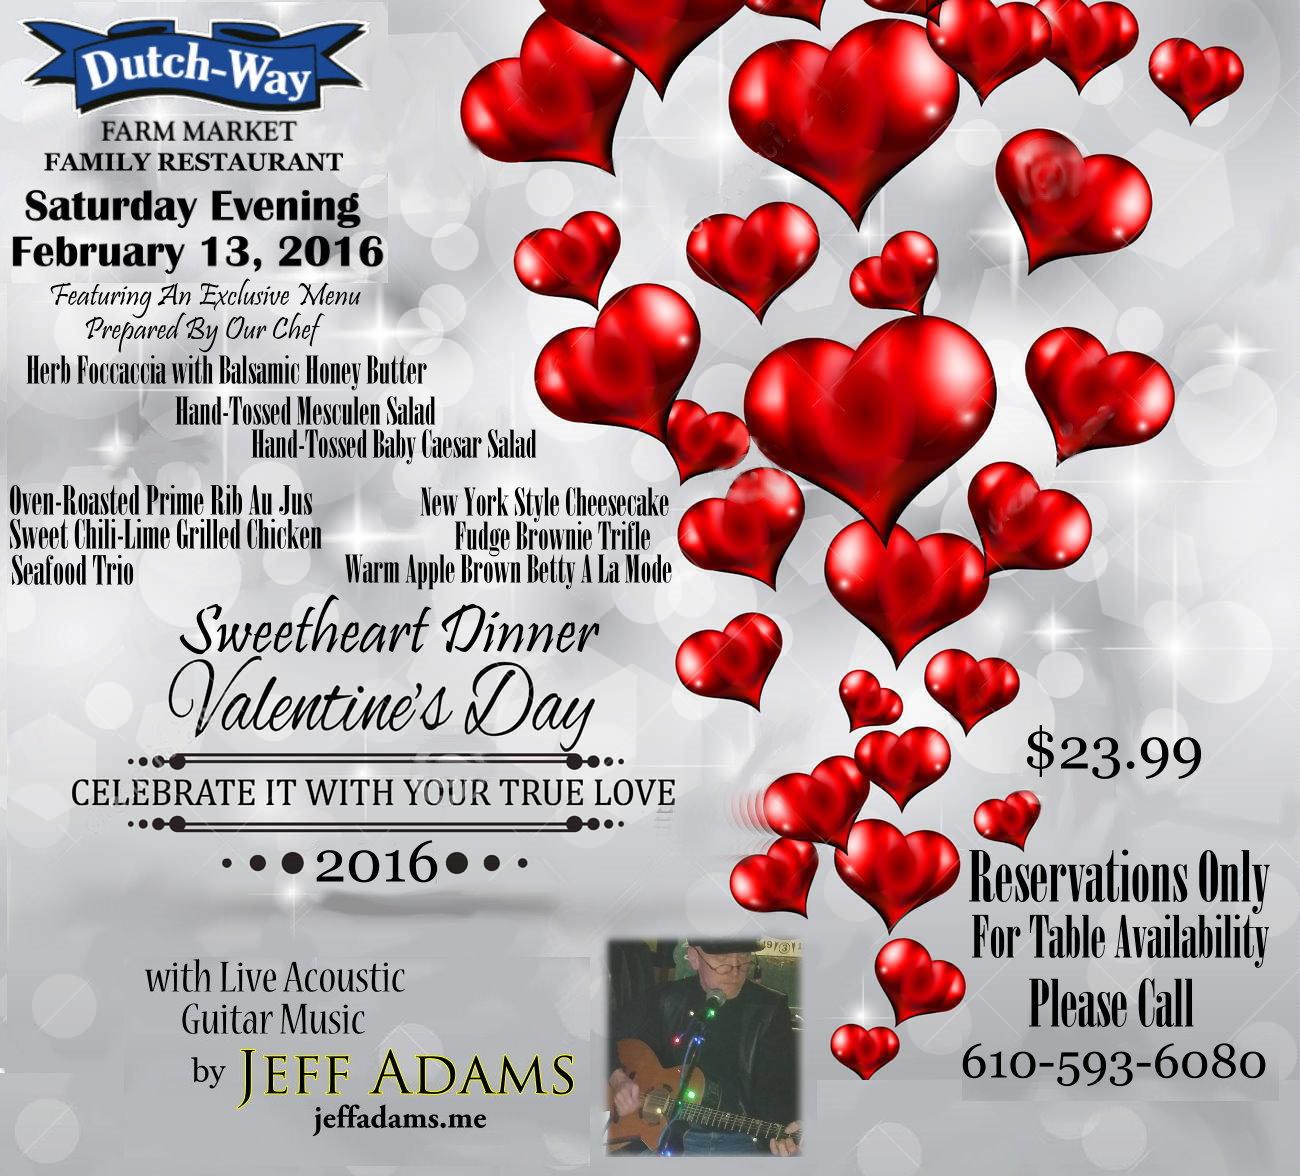 Jeff Adams @ Dutch-Way Family Restaurant on Feb 13th!